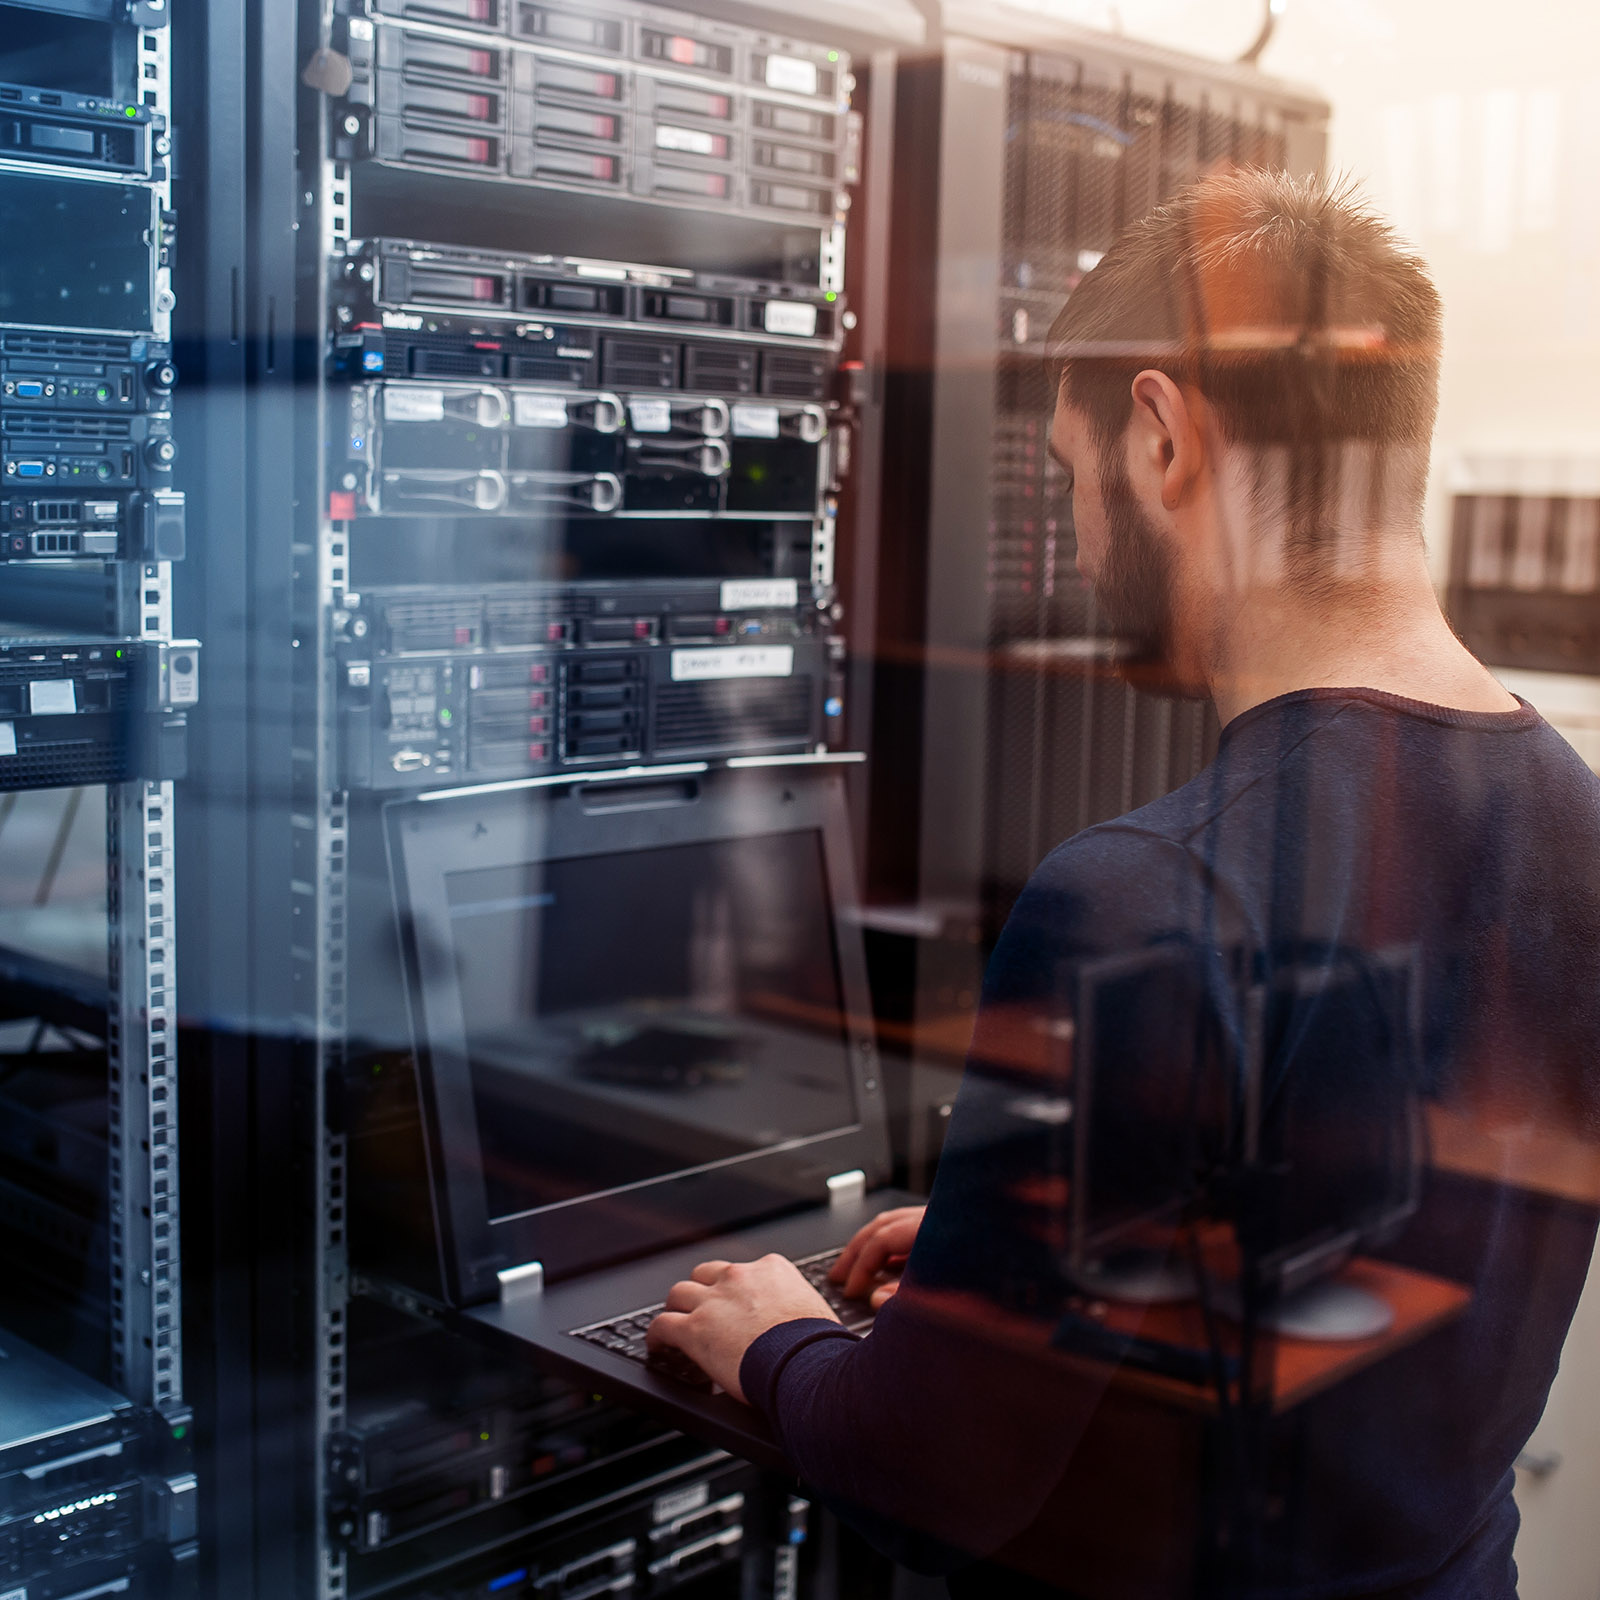 NTS Service-Techniker am Laptop im Serverraum bei der Arbeit